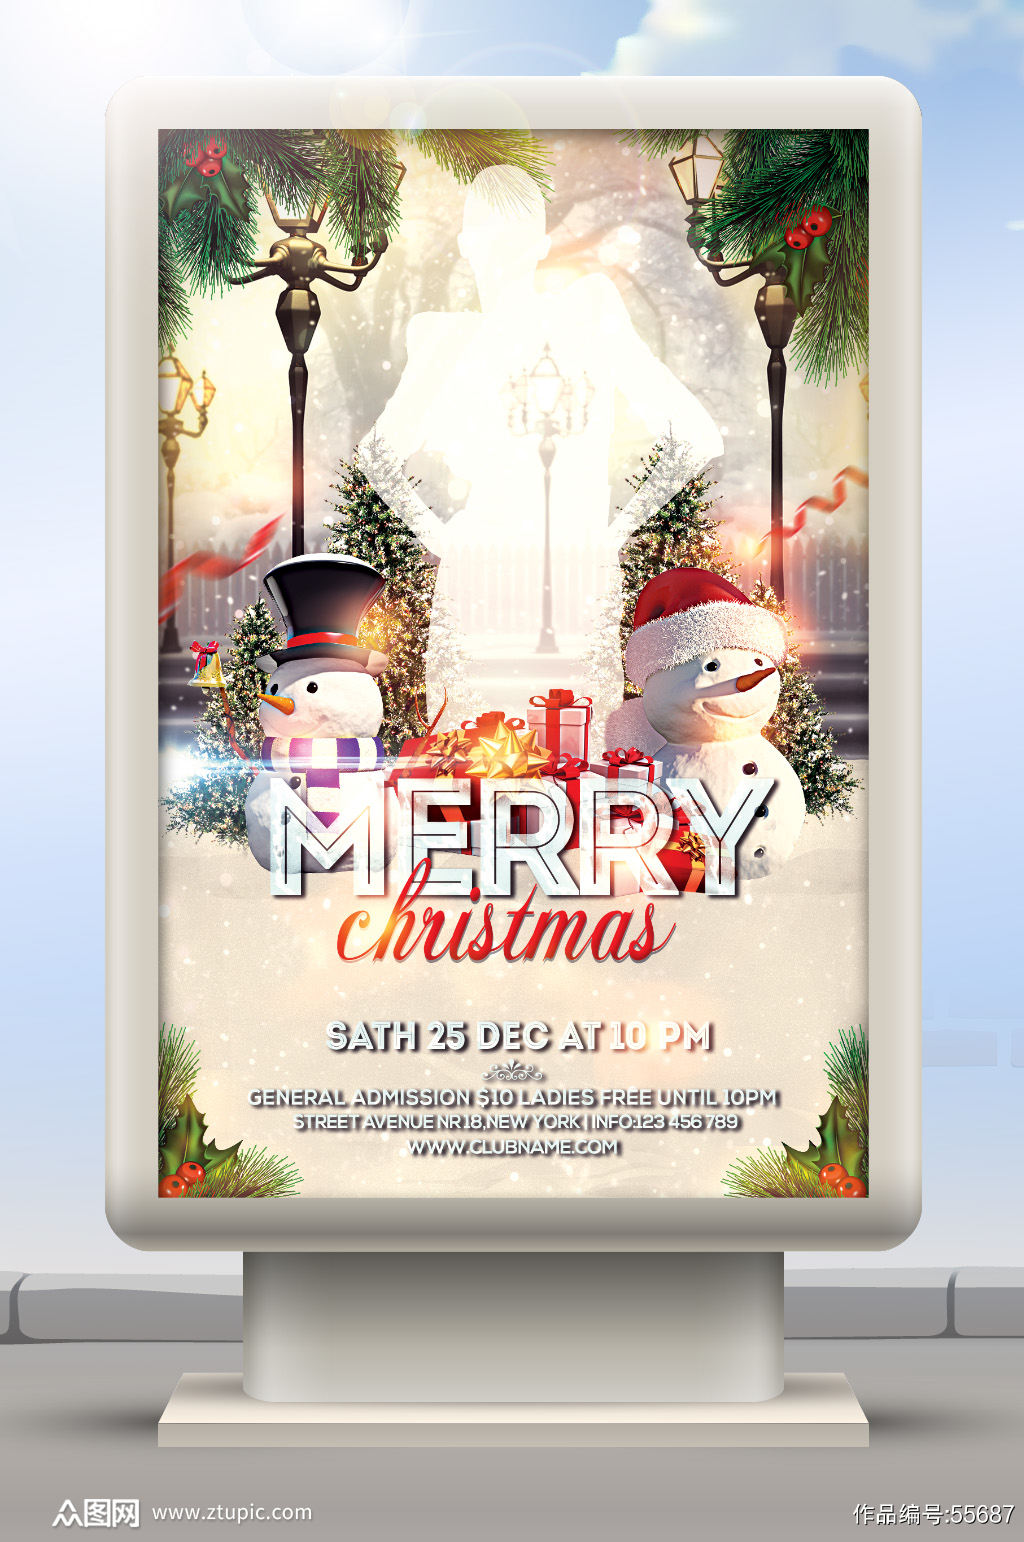 KTV酒吧圣诞海报背景素材